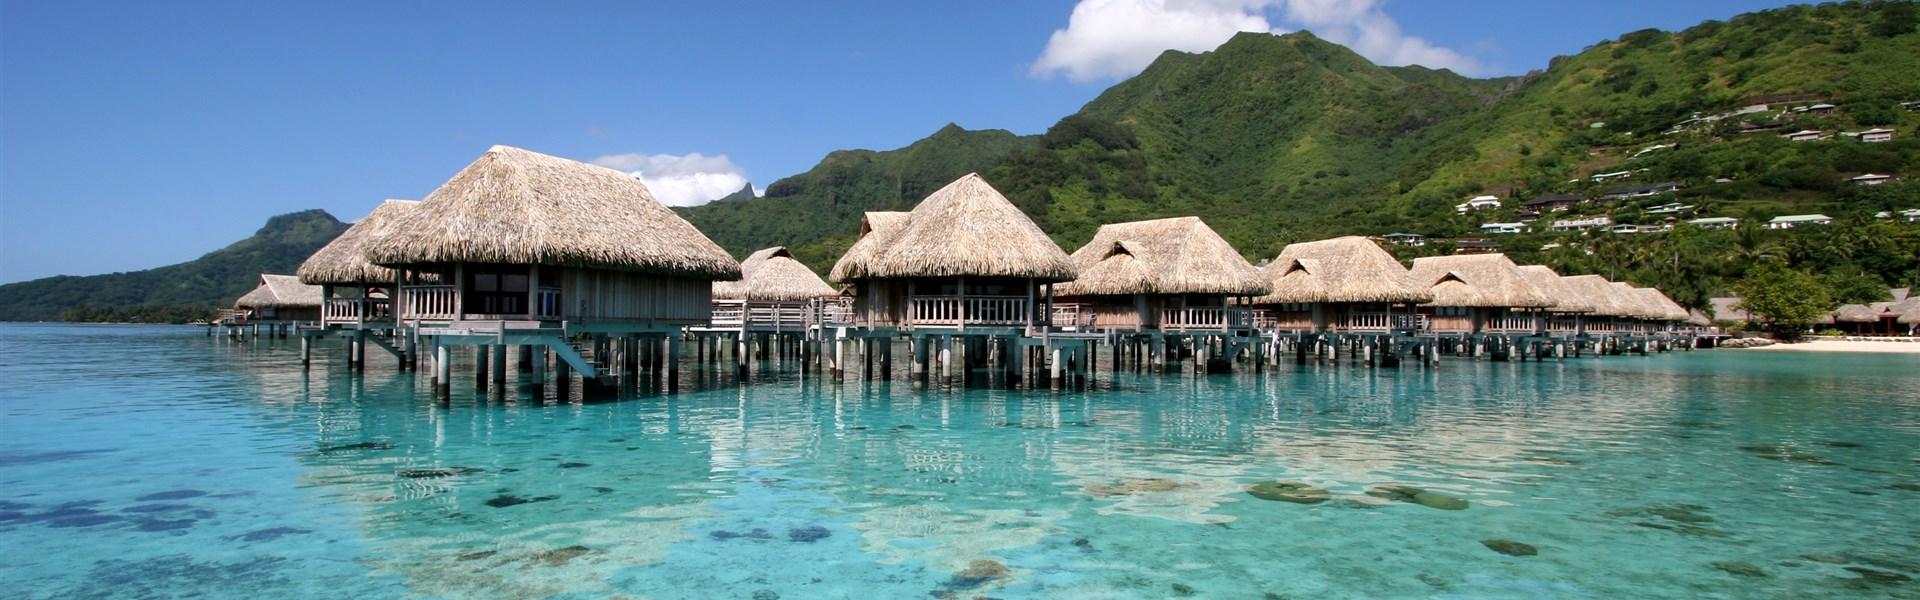 Marco Polo - Sofitel Moorea Ia Ora Beach Resort - ostrov Moorea -